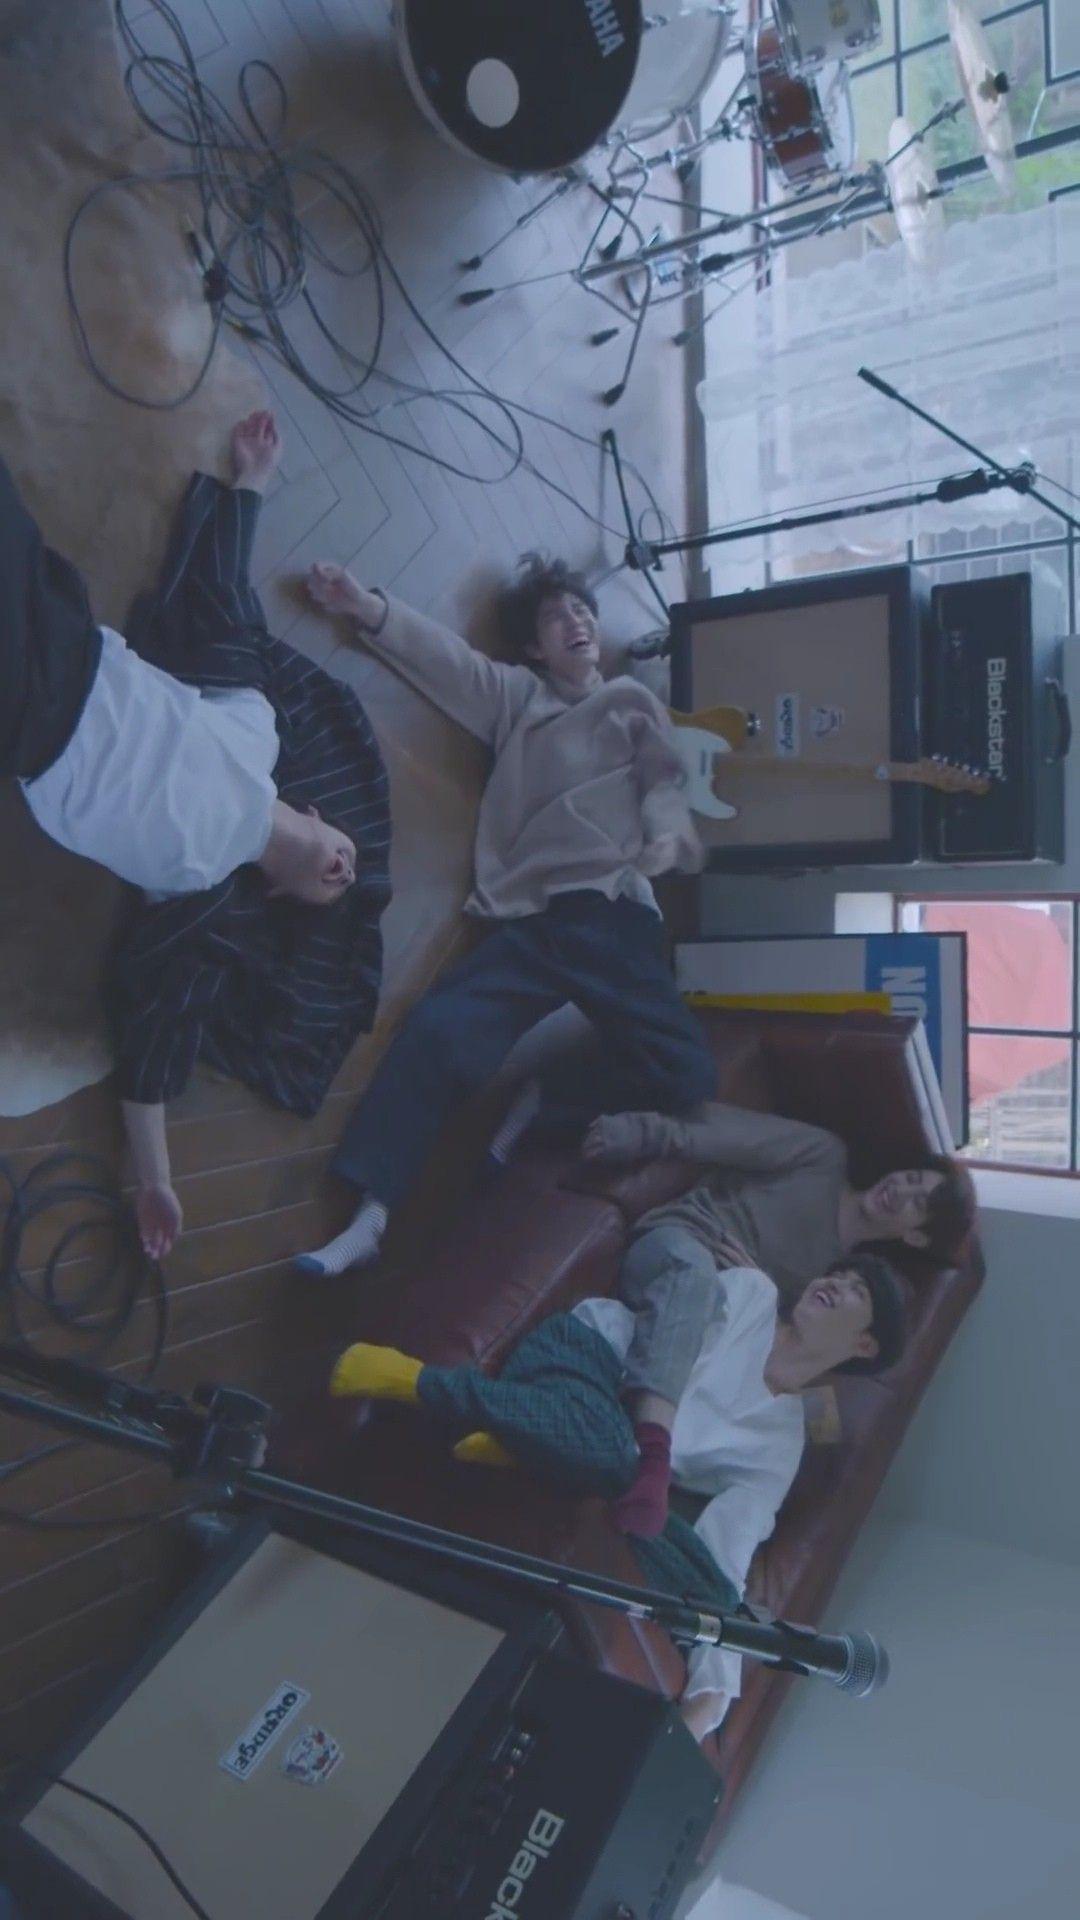 The Rose Kpop Wallpaper #Therose #wallpaper #kpop Dojoon Hajoon Woosung JaeHyeong